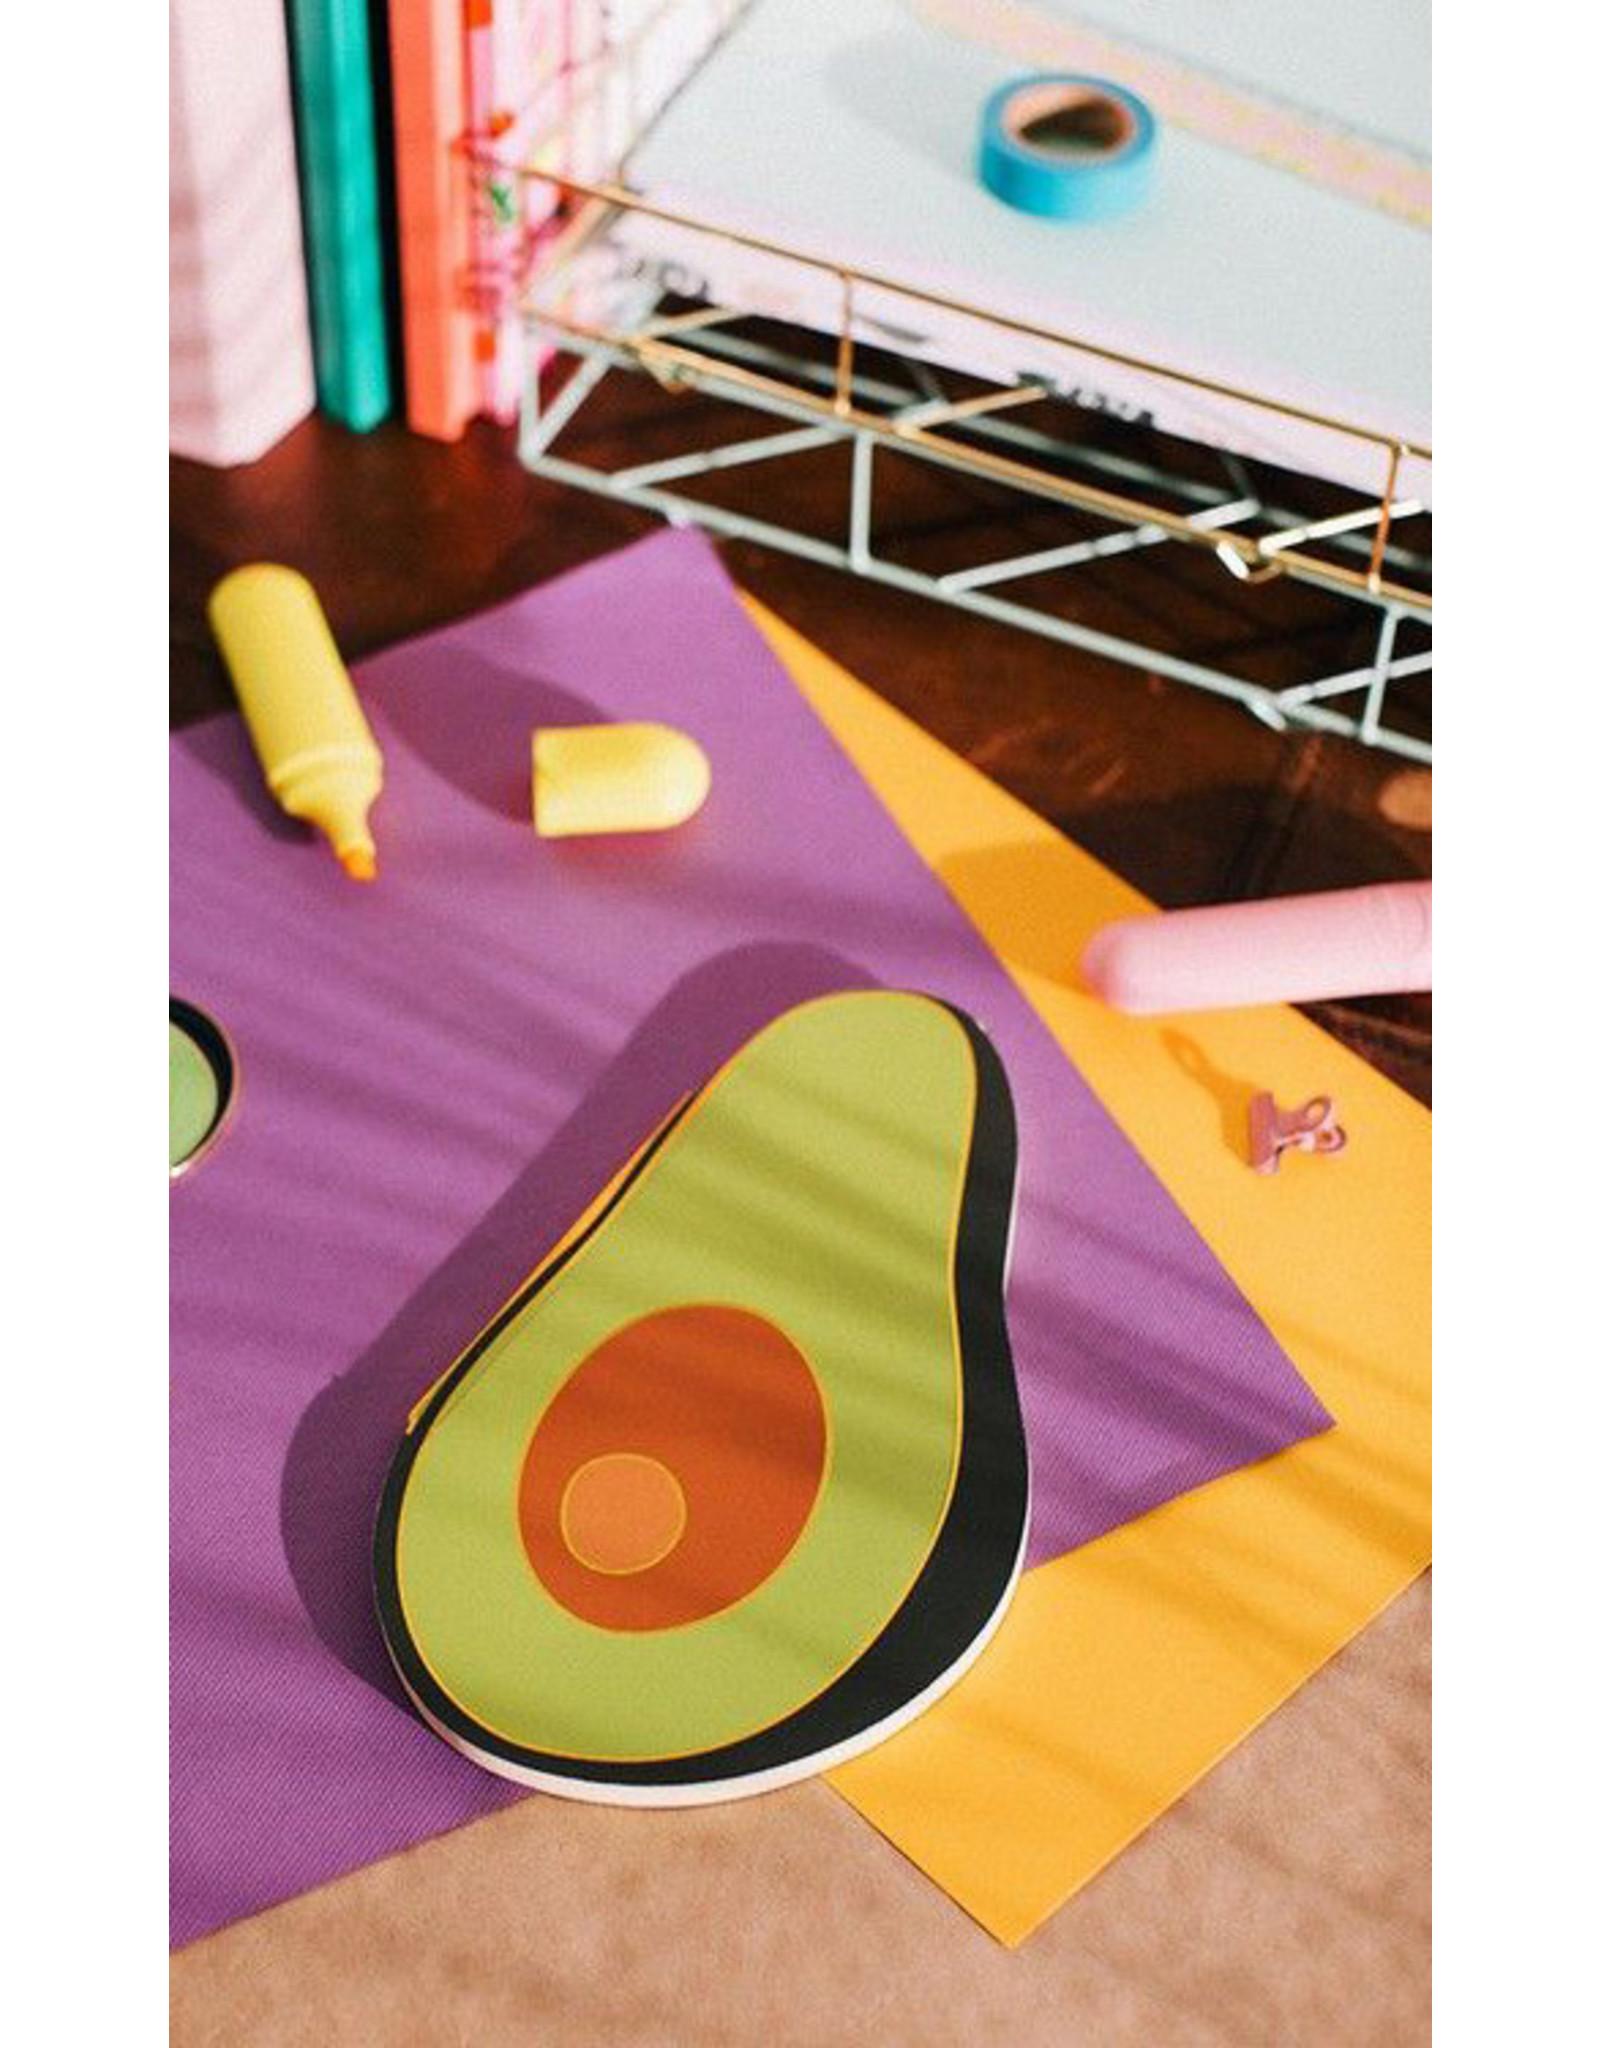 Notaboek avocado